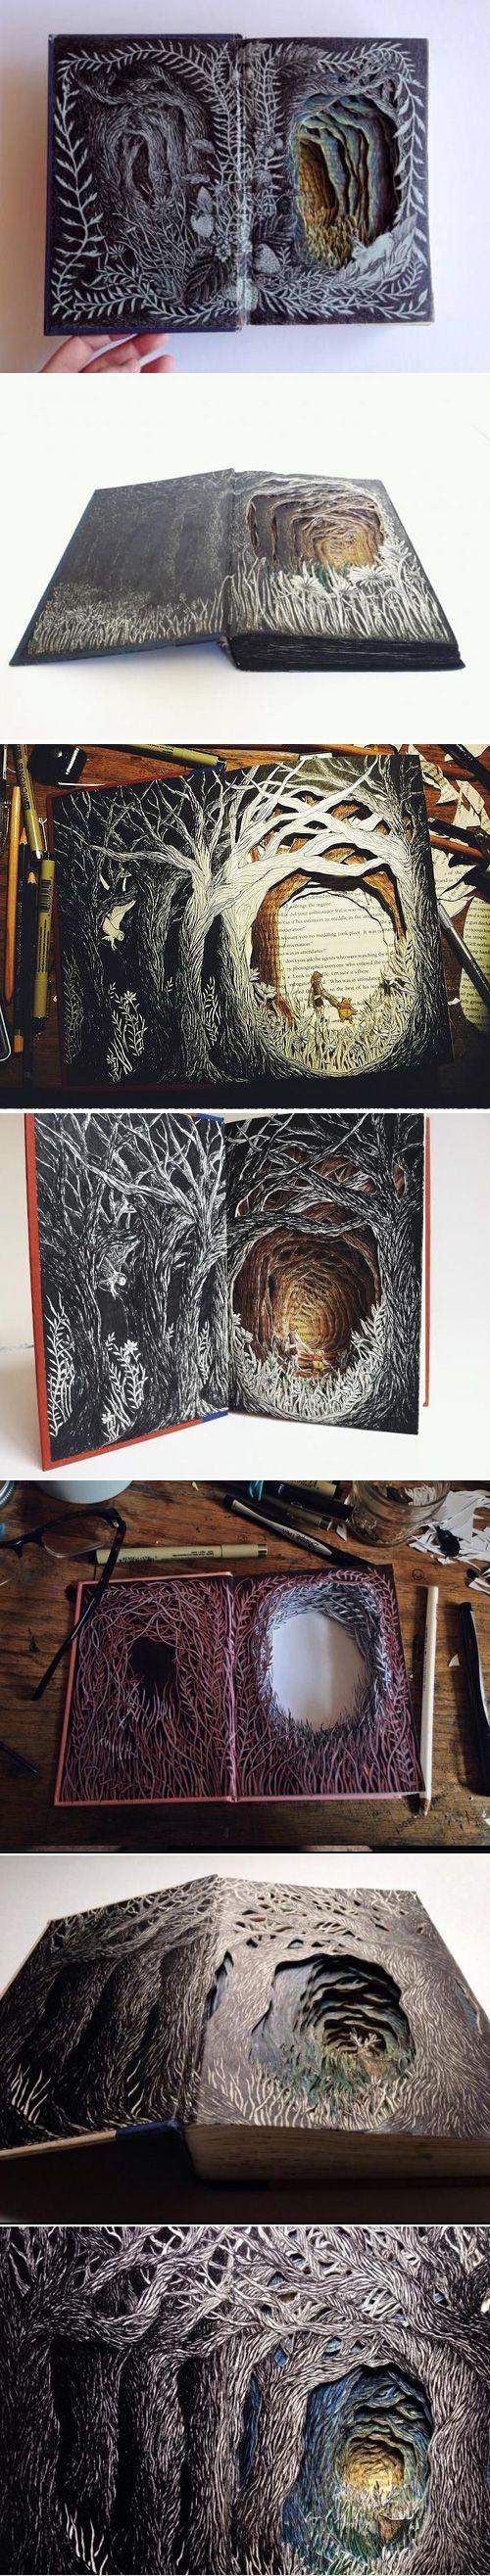 Mroczna książka